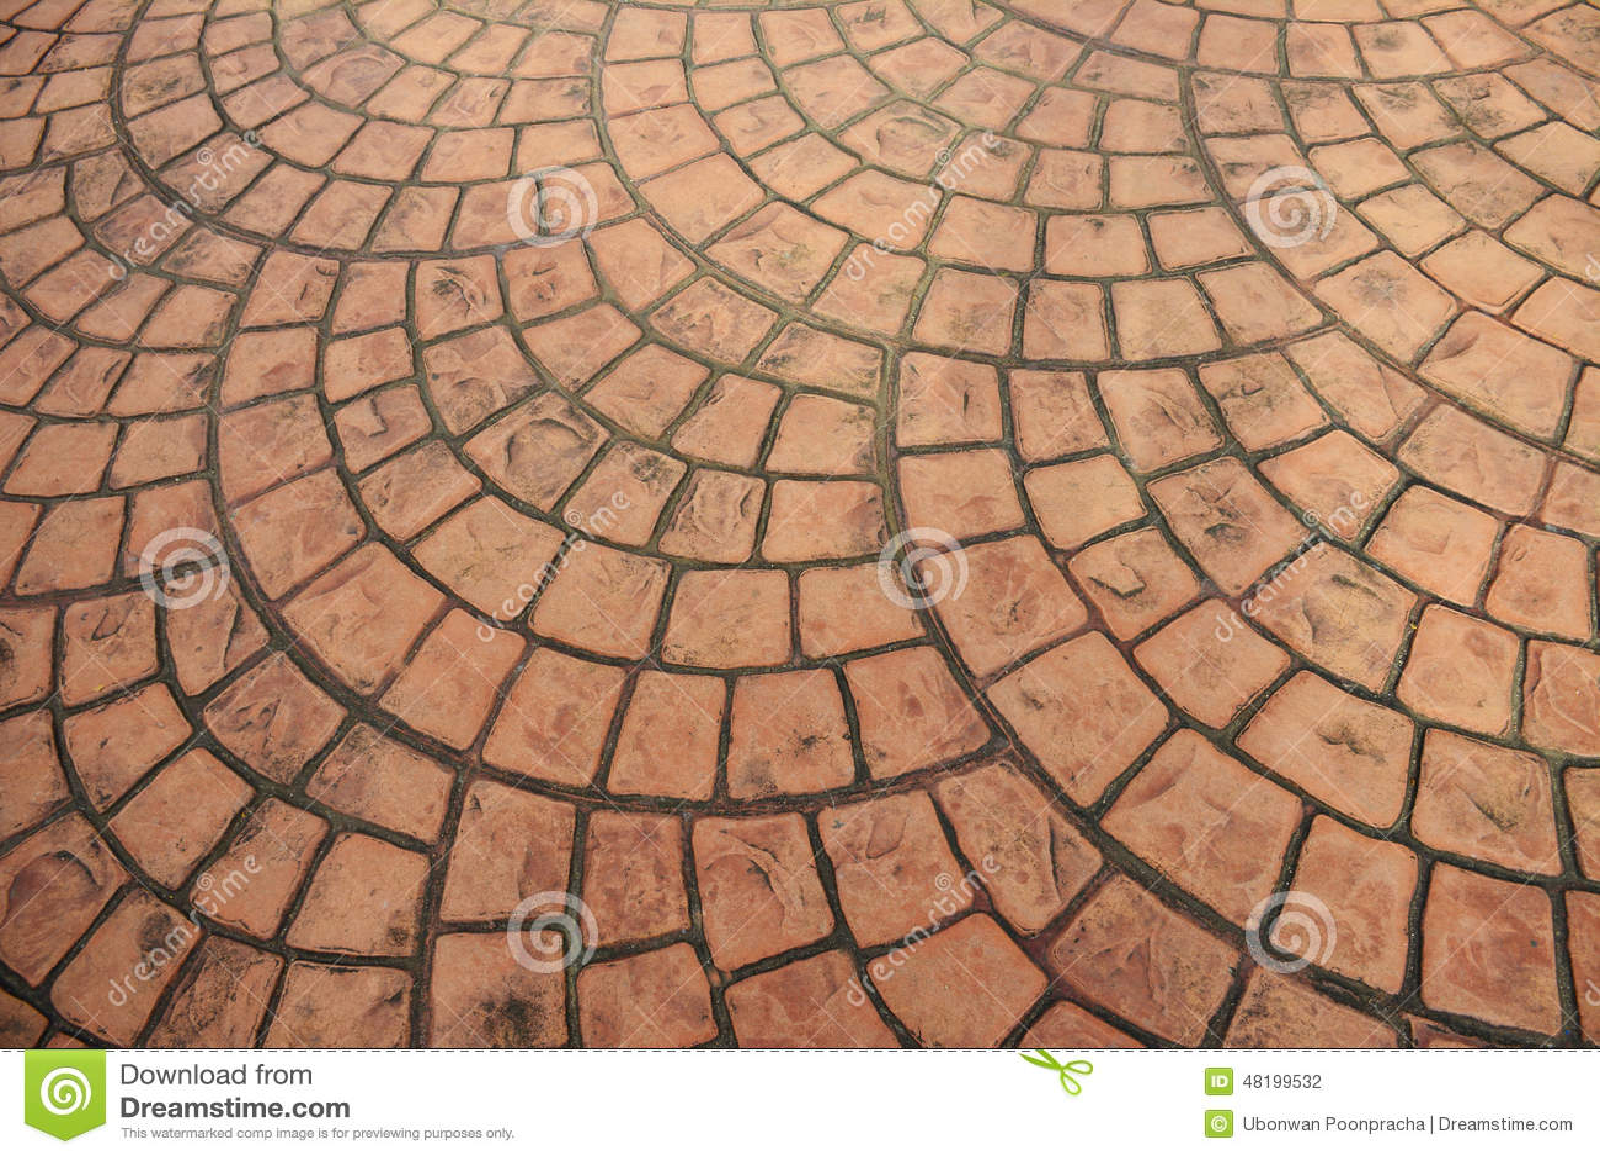 Viejo fondo anaranjado del piso del ladrillo foto de - Patio piso de ladrillo ...